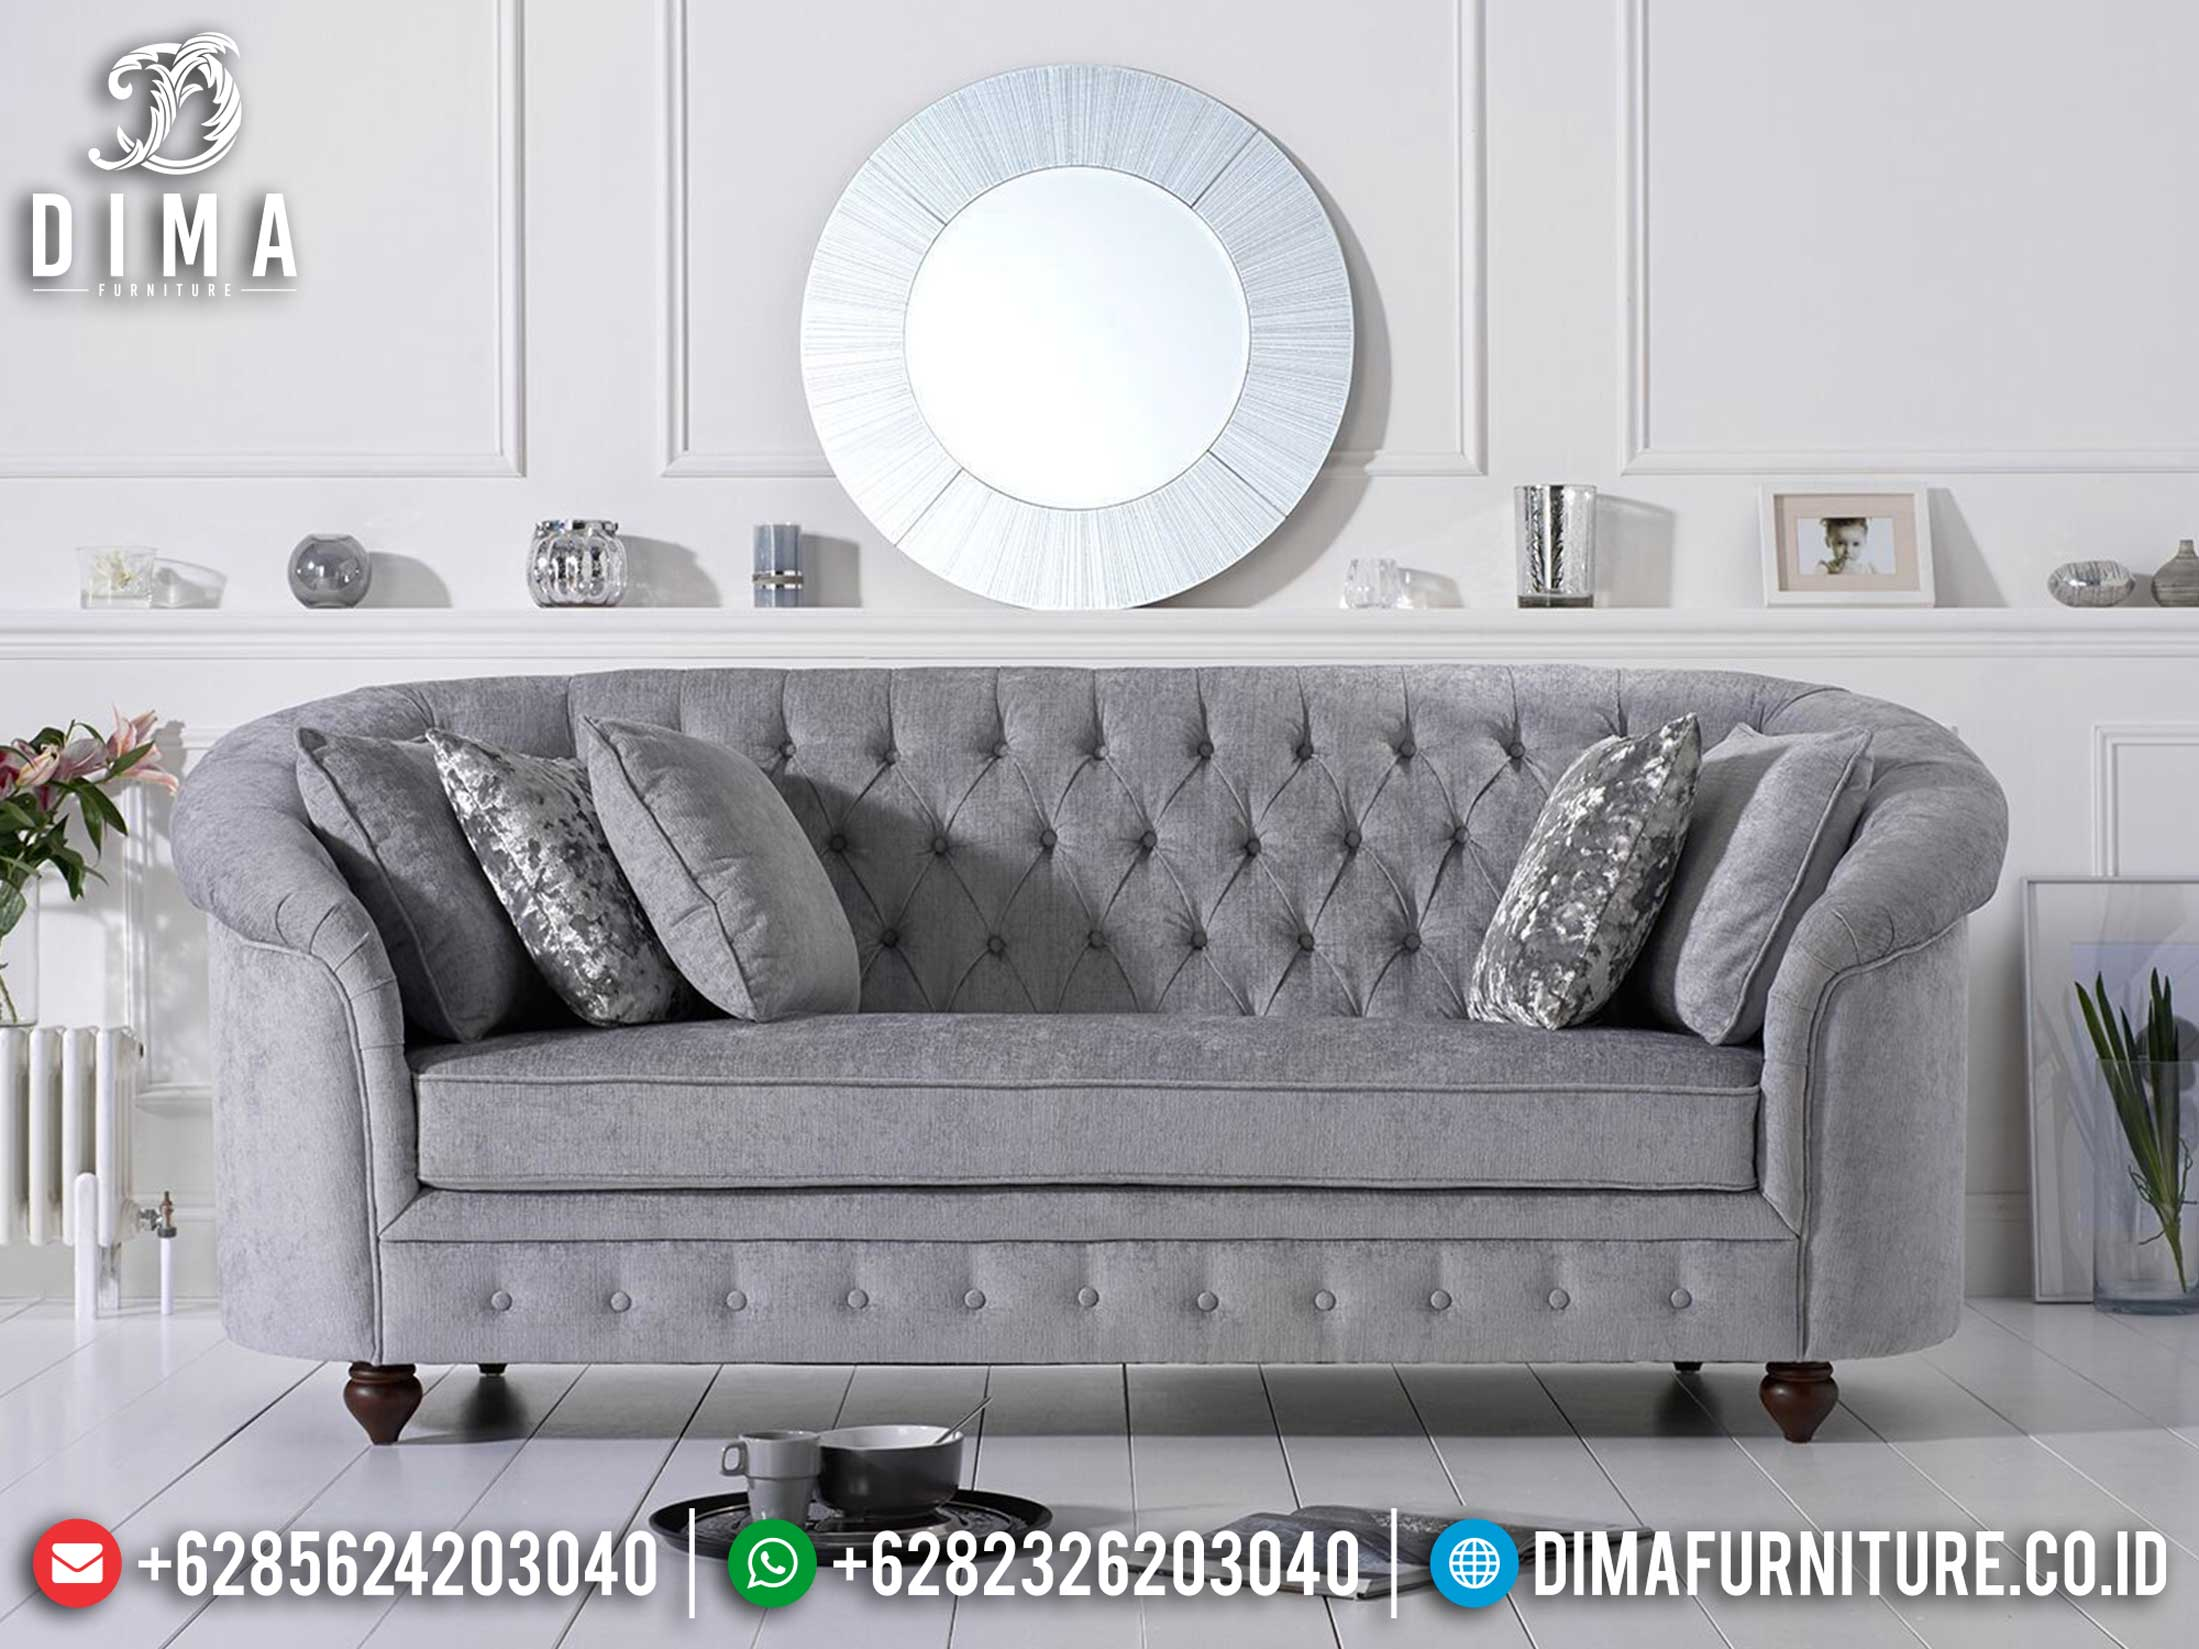 Sofa Tamu Minimalis 3 Dudukan Great Fabric Beludru New Year Update Mm-0745